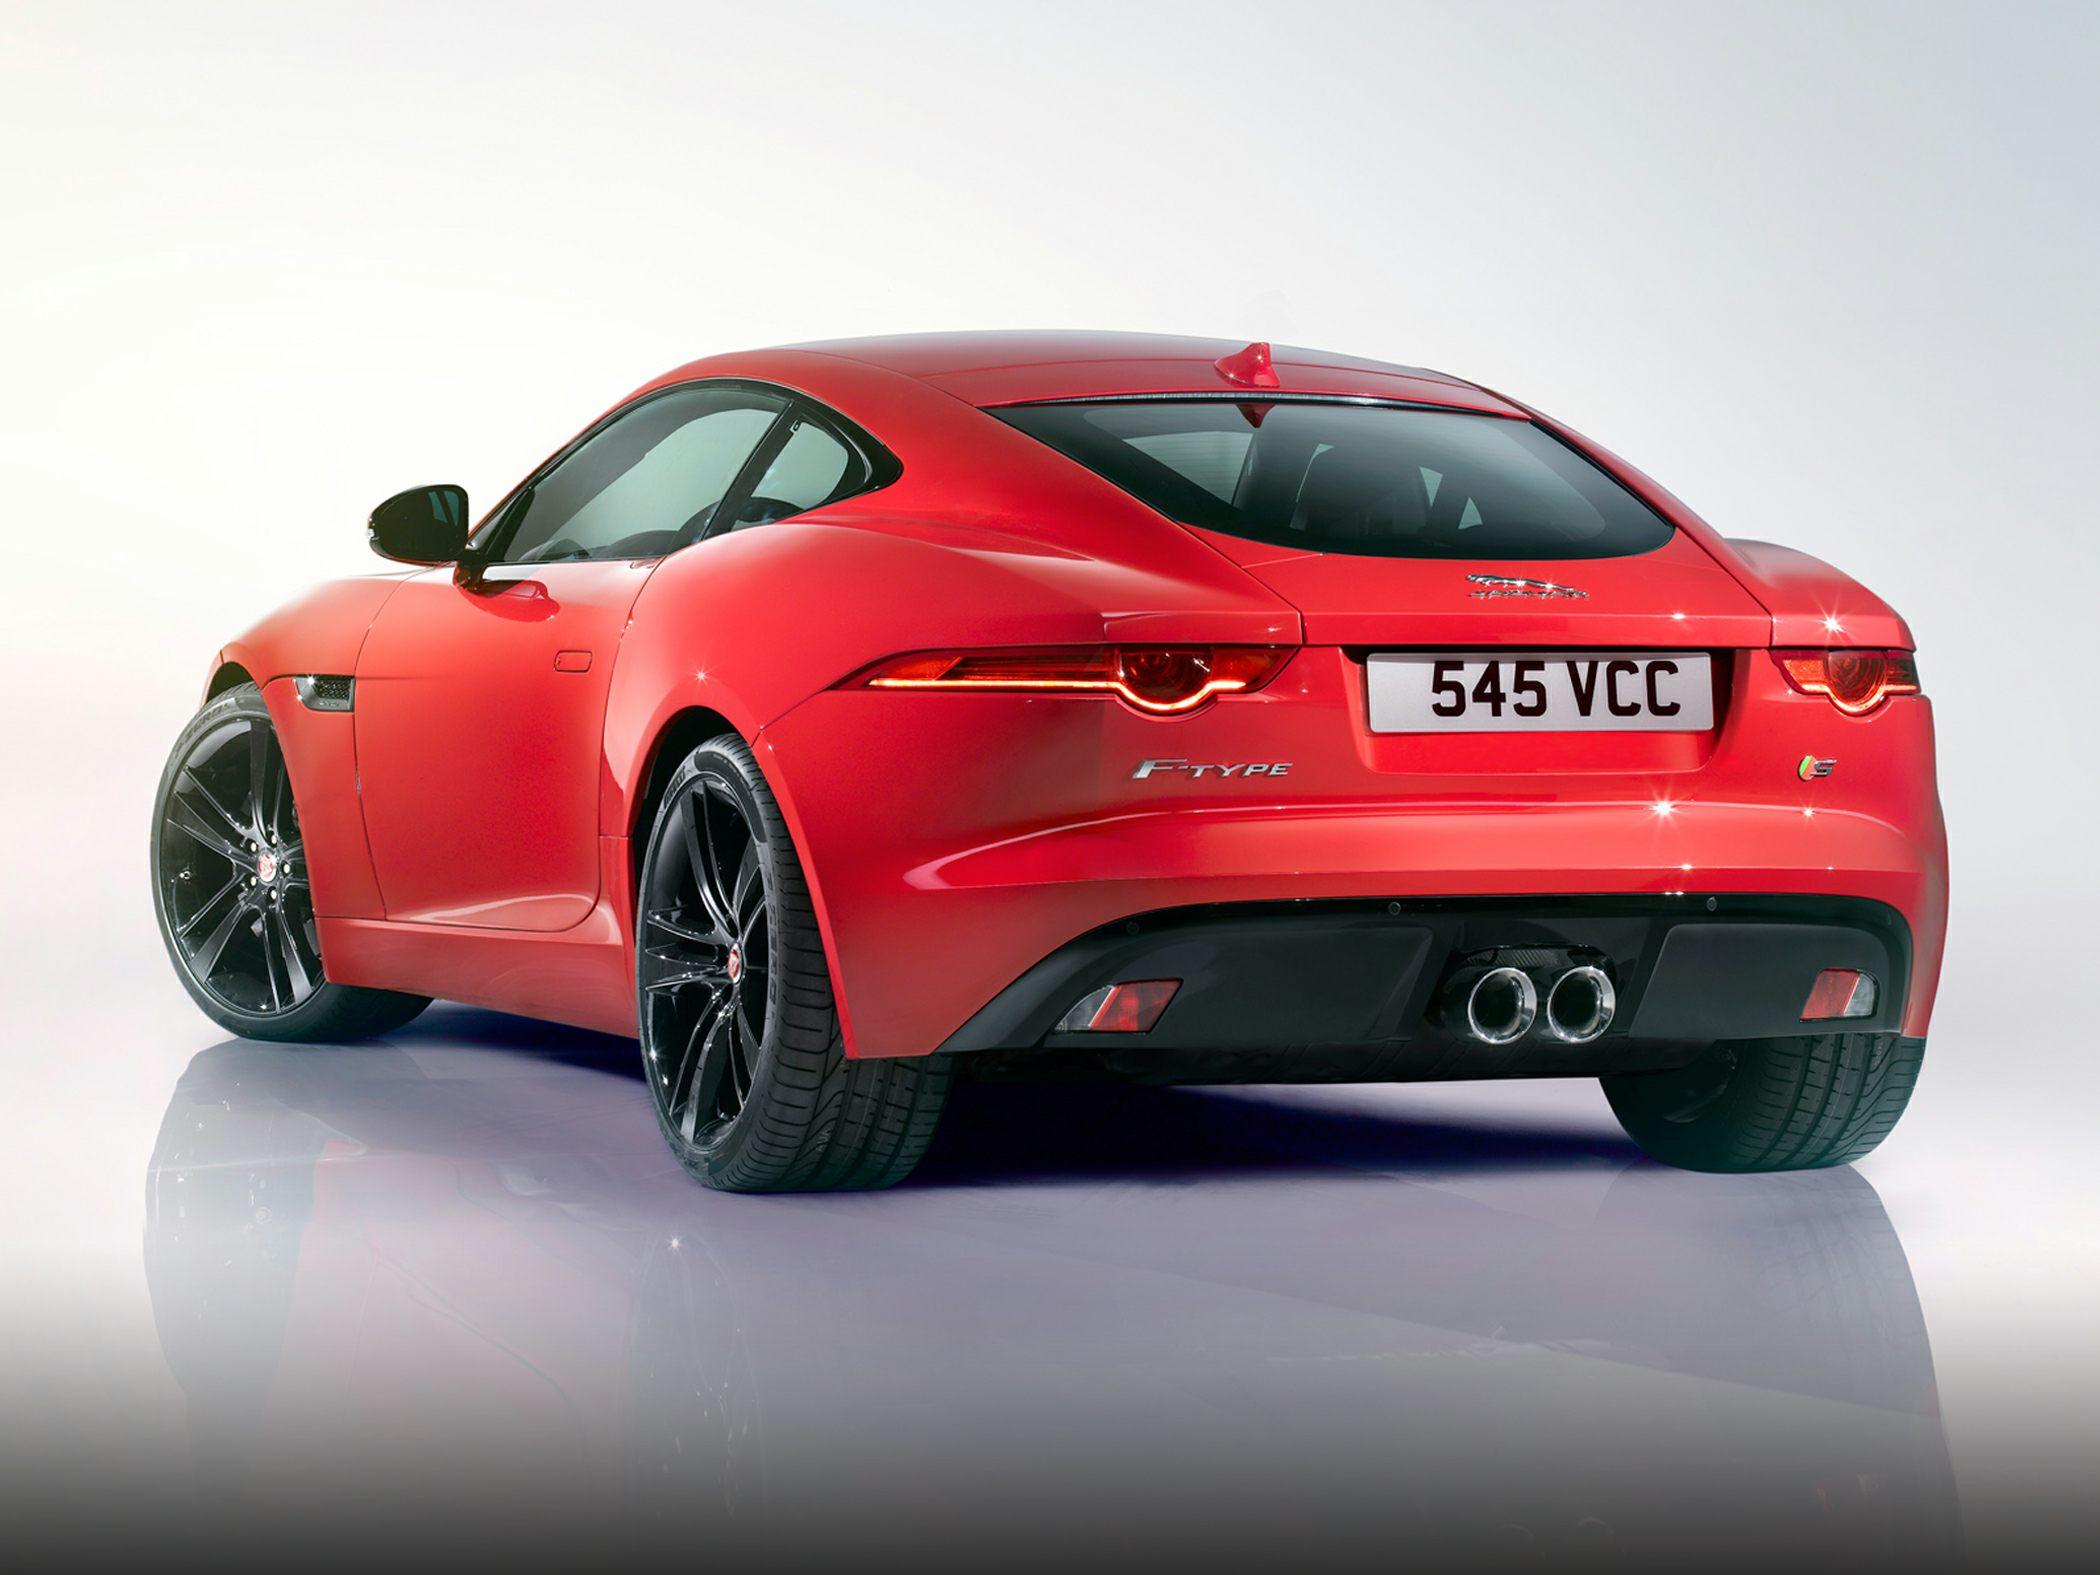 cars images j f hd front s type jaguar wallpaper